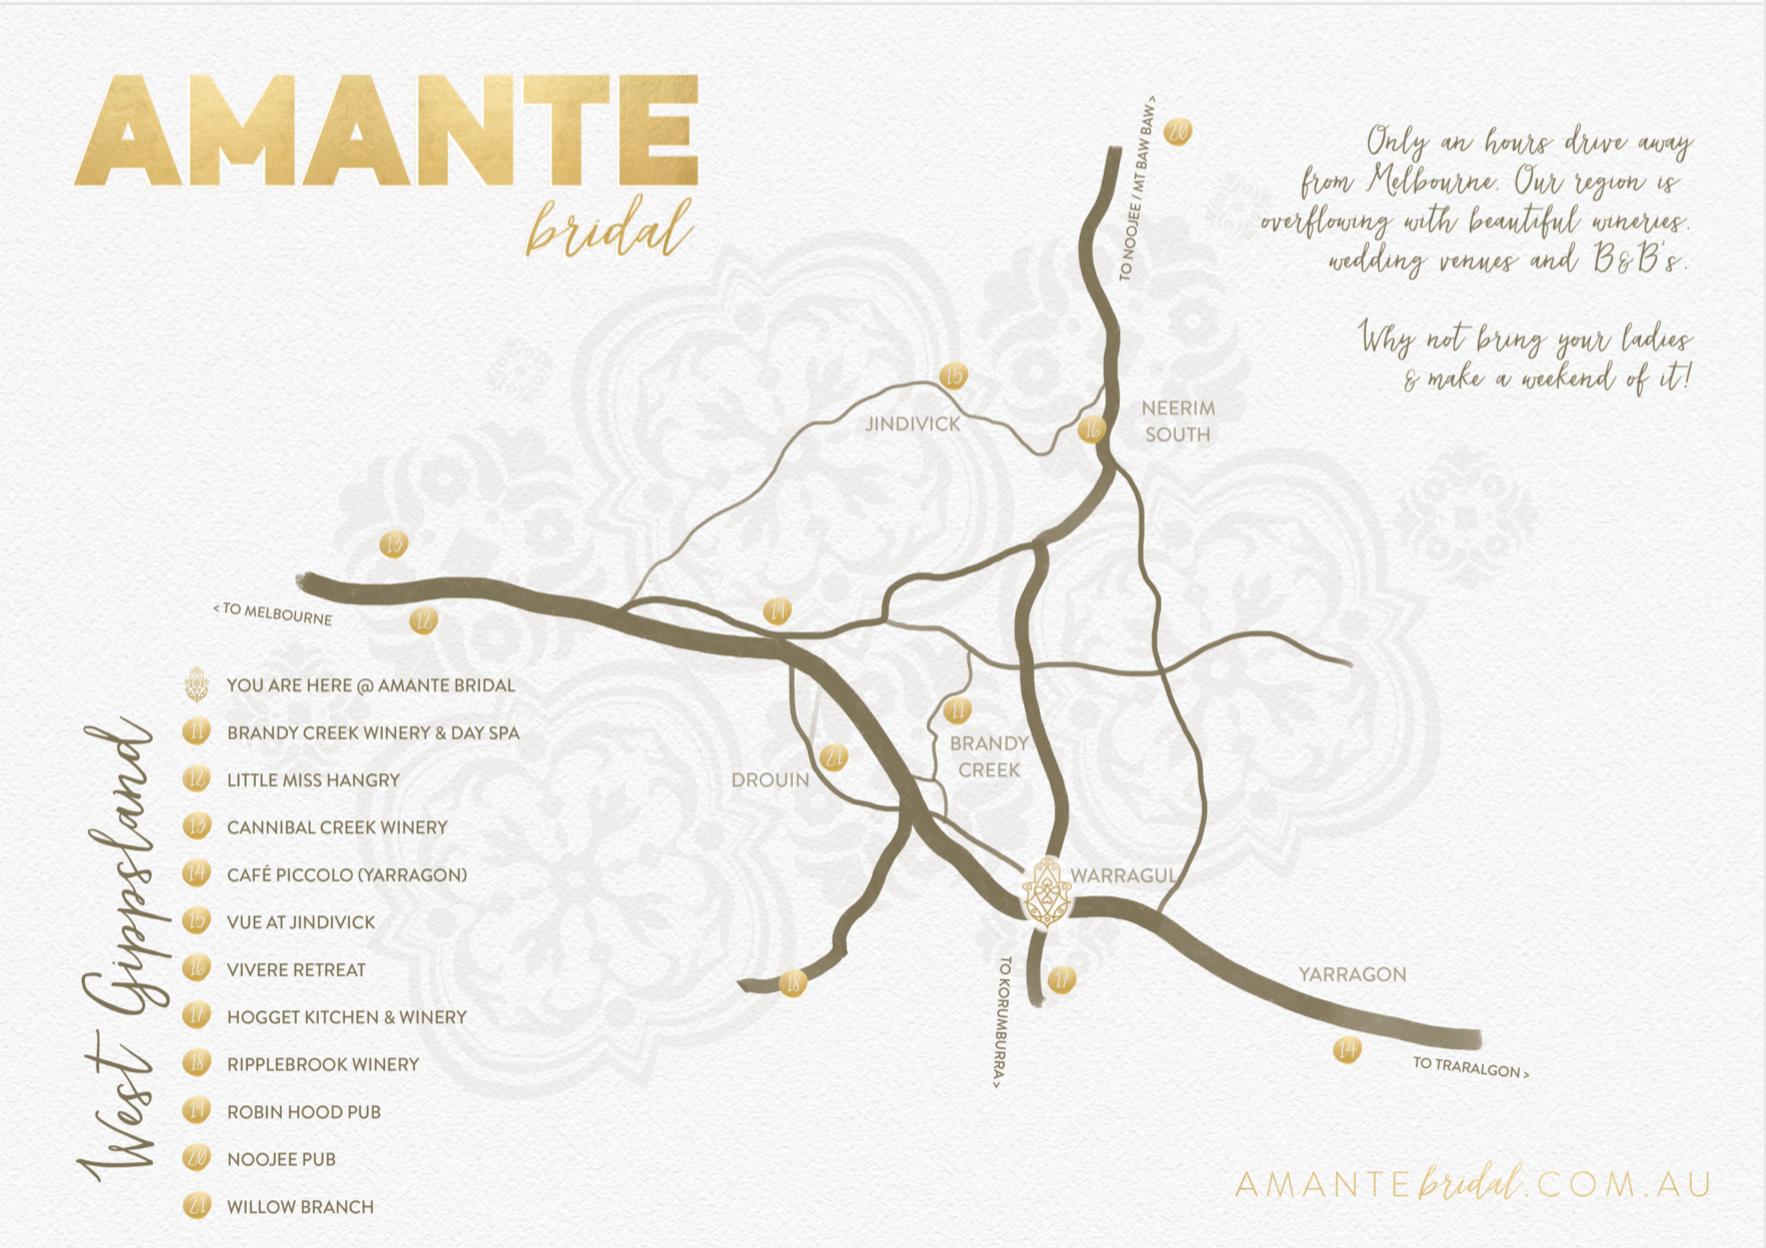 Amante Bridal | Warragul Map